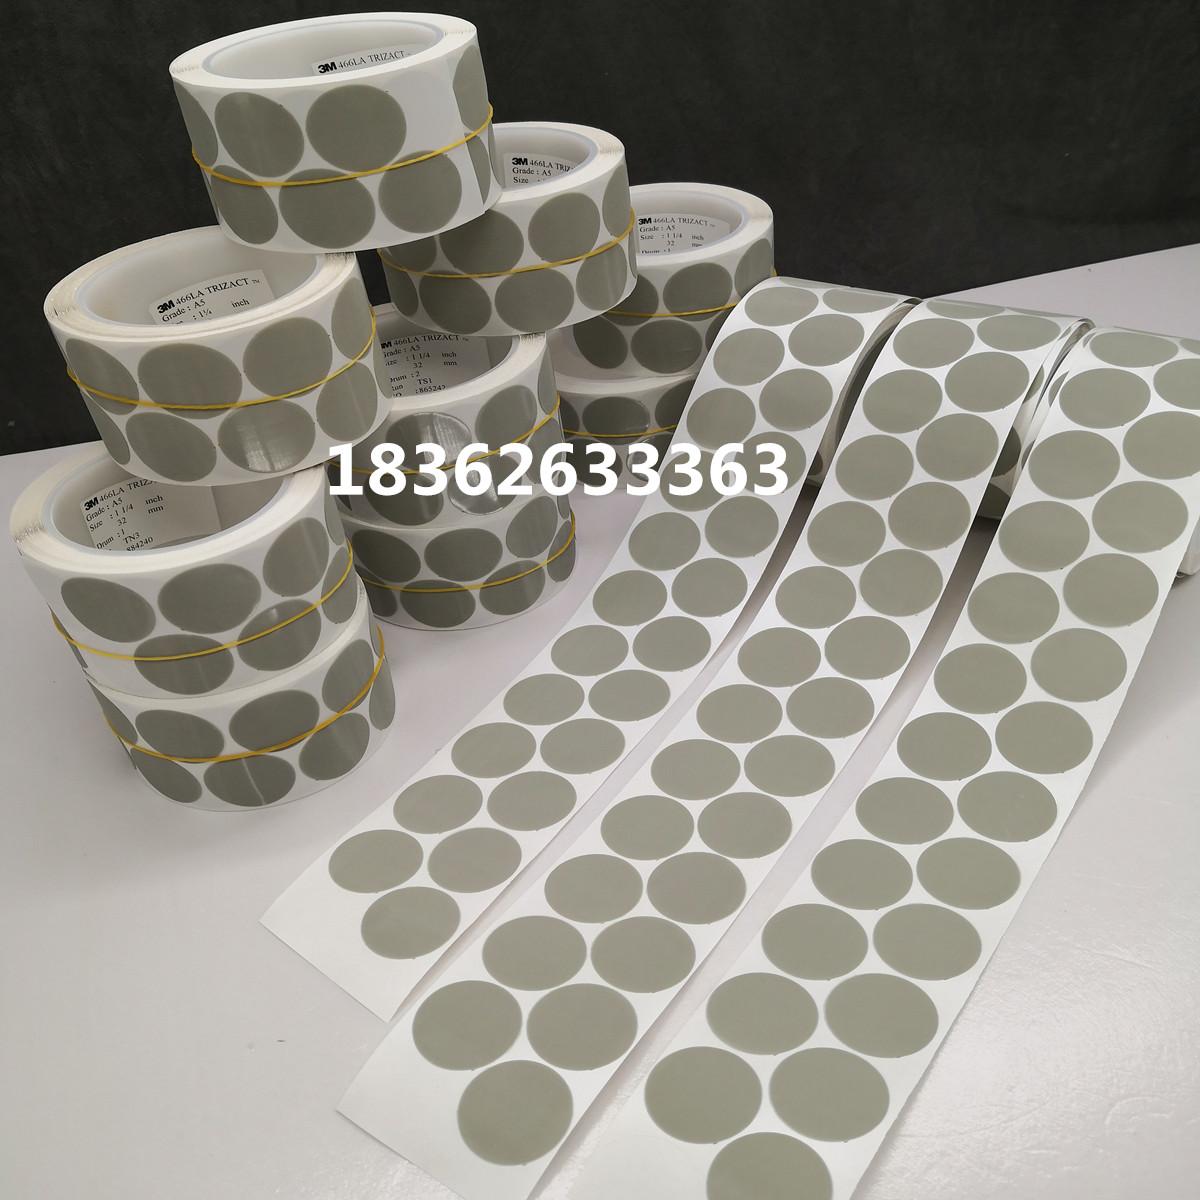 3 M 466 LA a 5ピラミッド砂紙3 M 666 LAバックゴム砂皿3000目砂紙巻き砂トレーロール